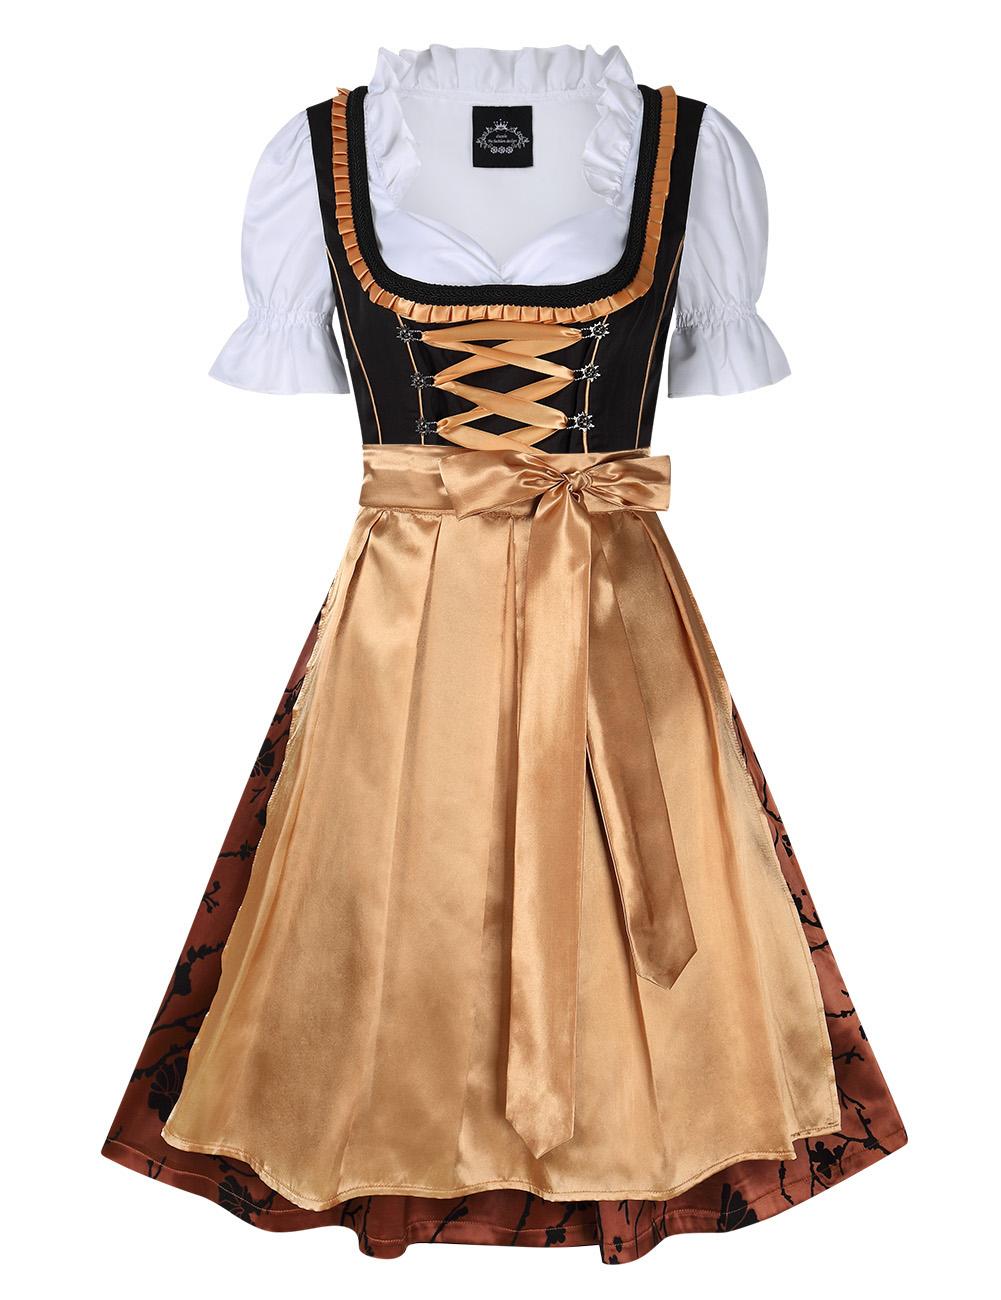 [EU Direct] Women's Classic Stylish Dirndl Dress Three PCS Suit for Bavarian Oktoberfest Costumes